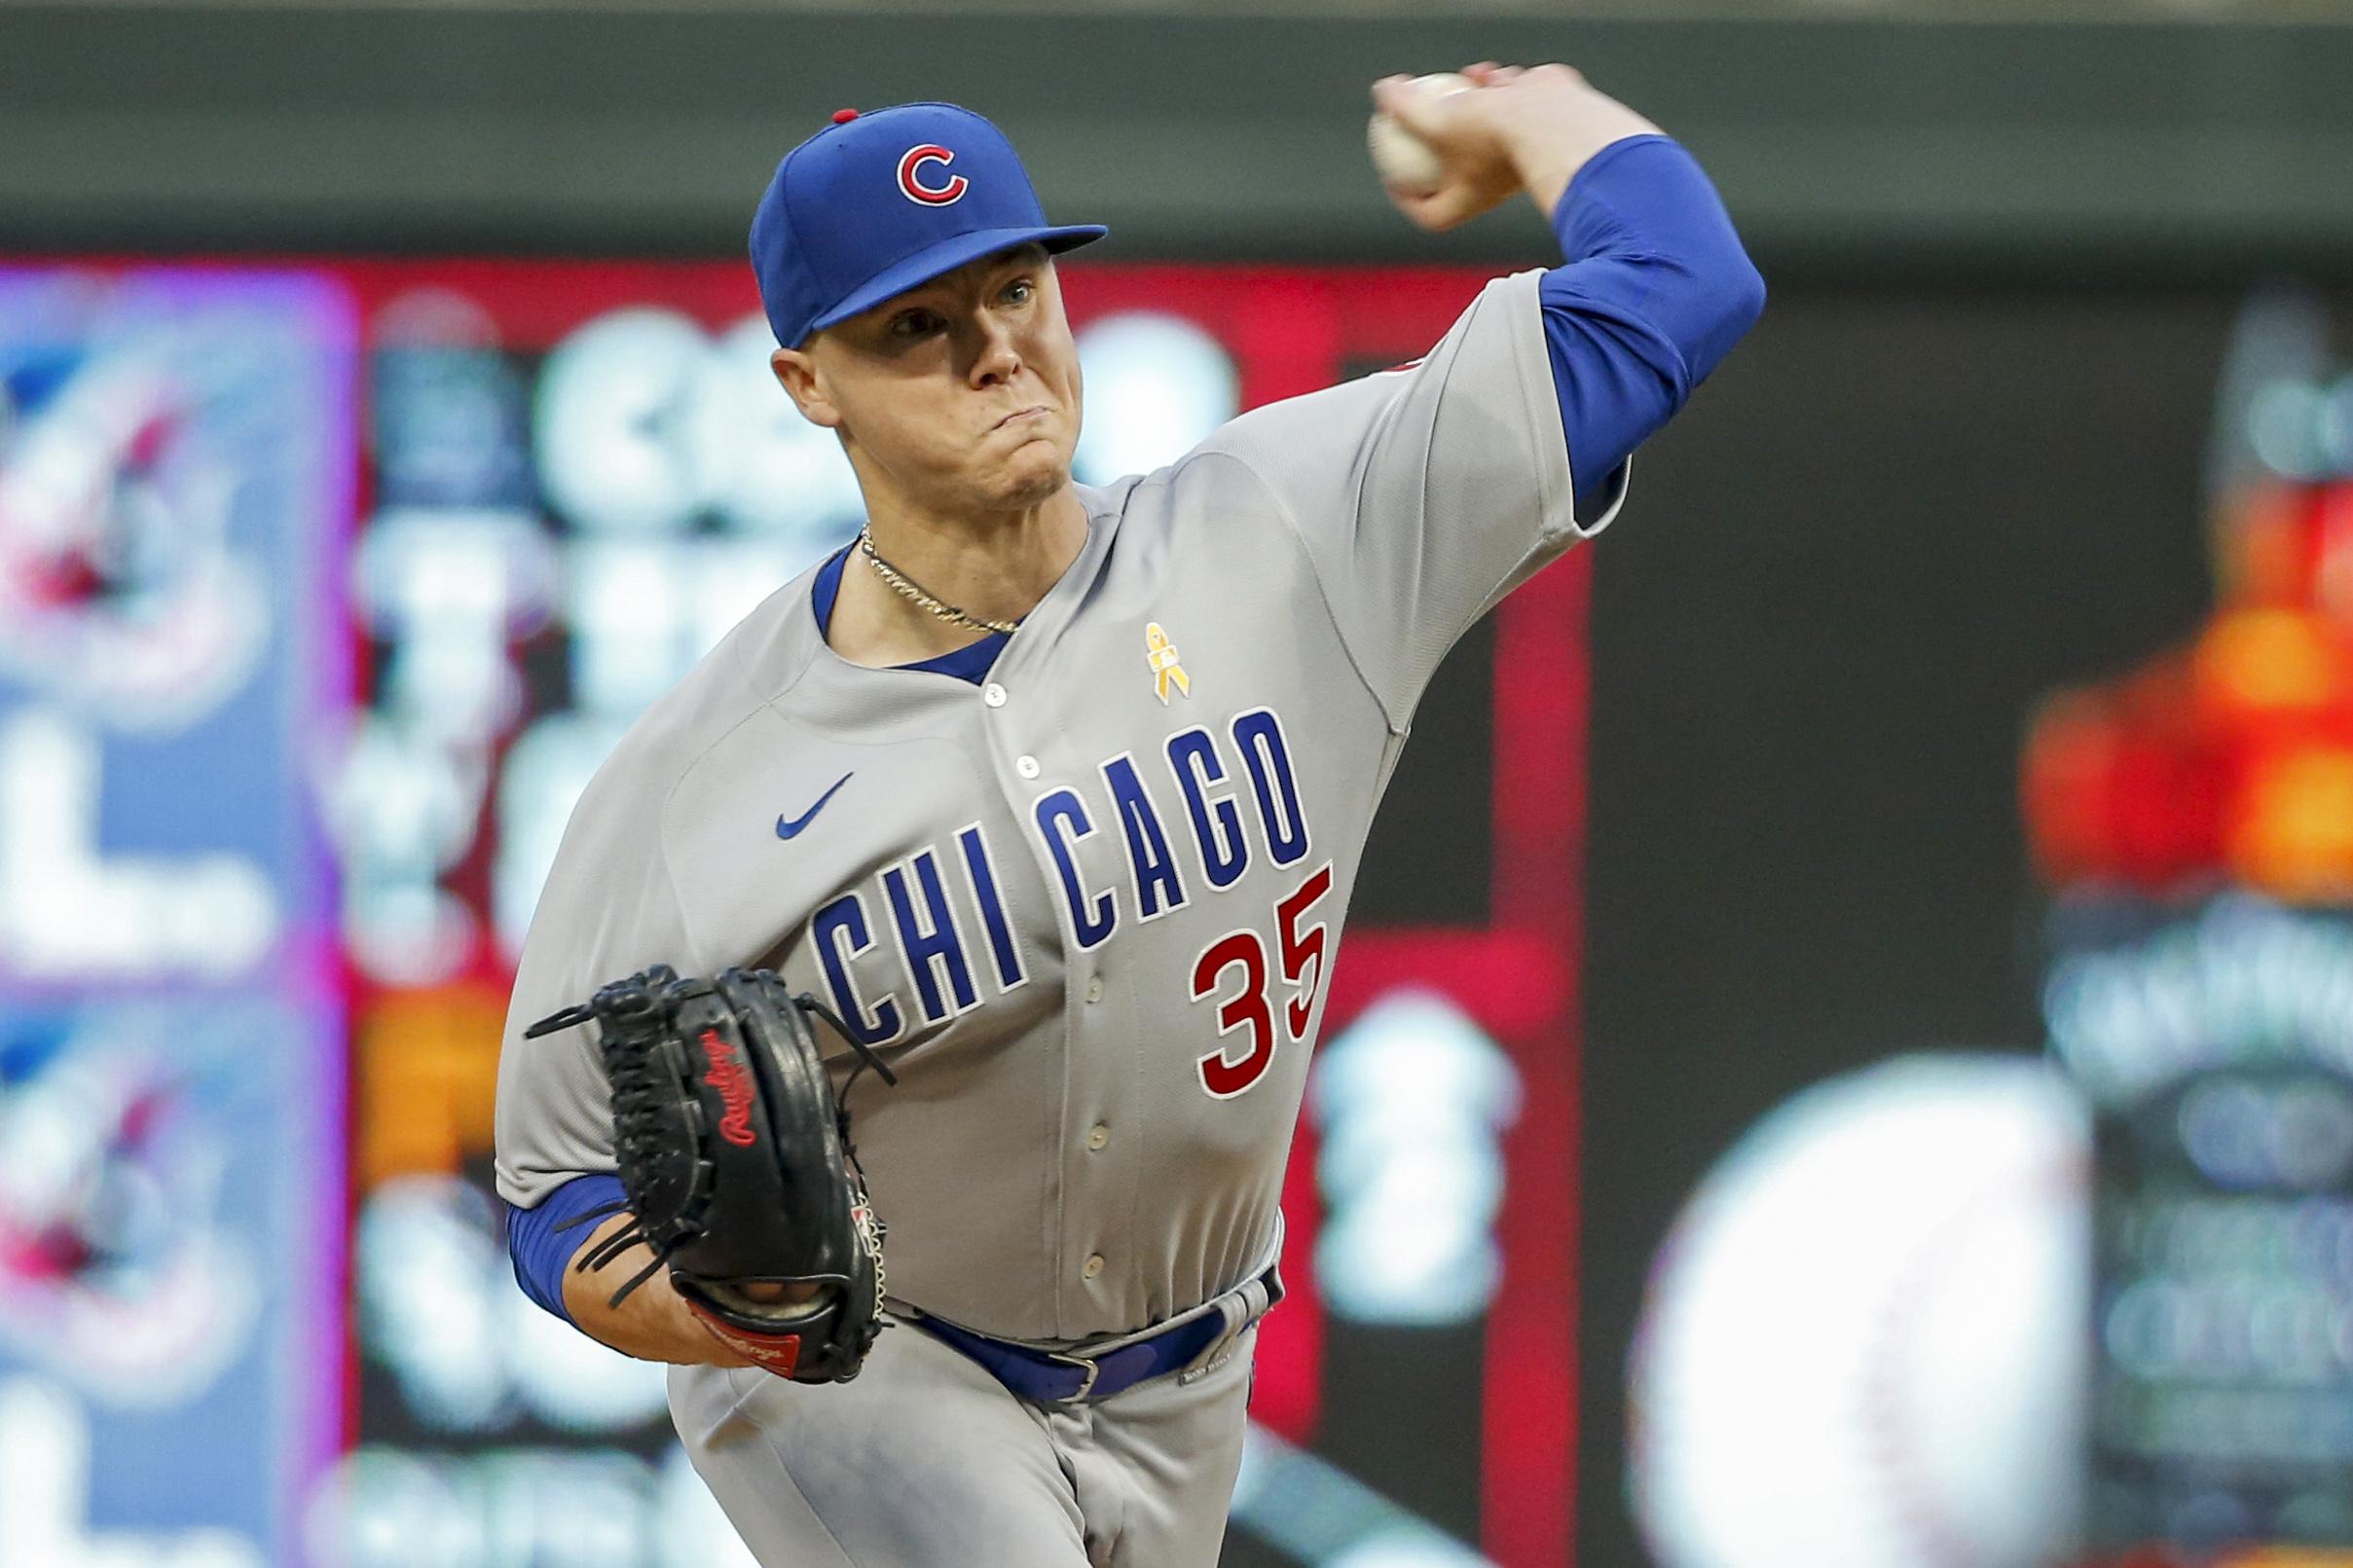 MLB: Chicago Cubs at Minnesota Twins